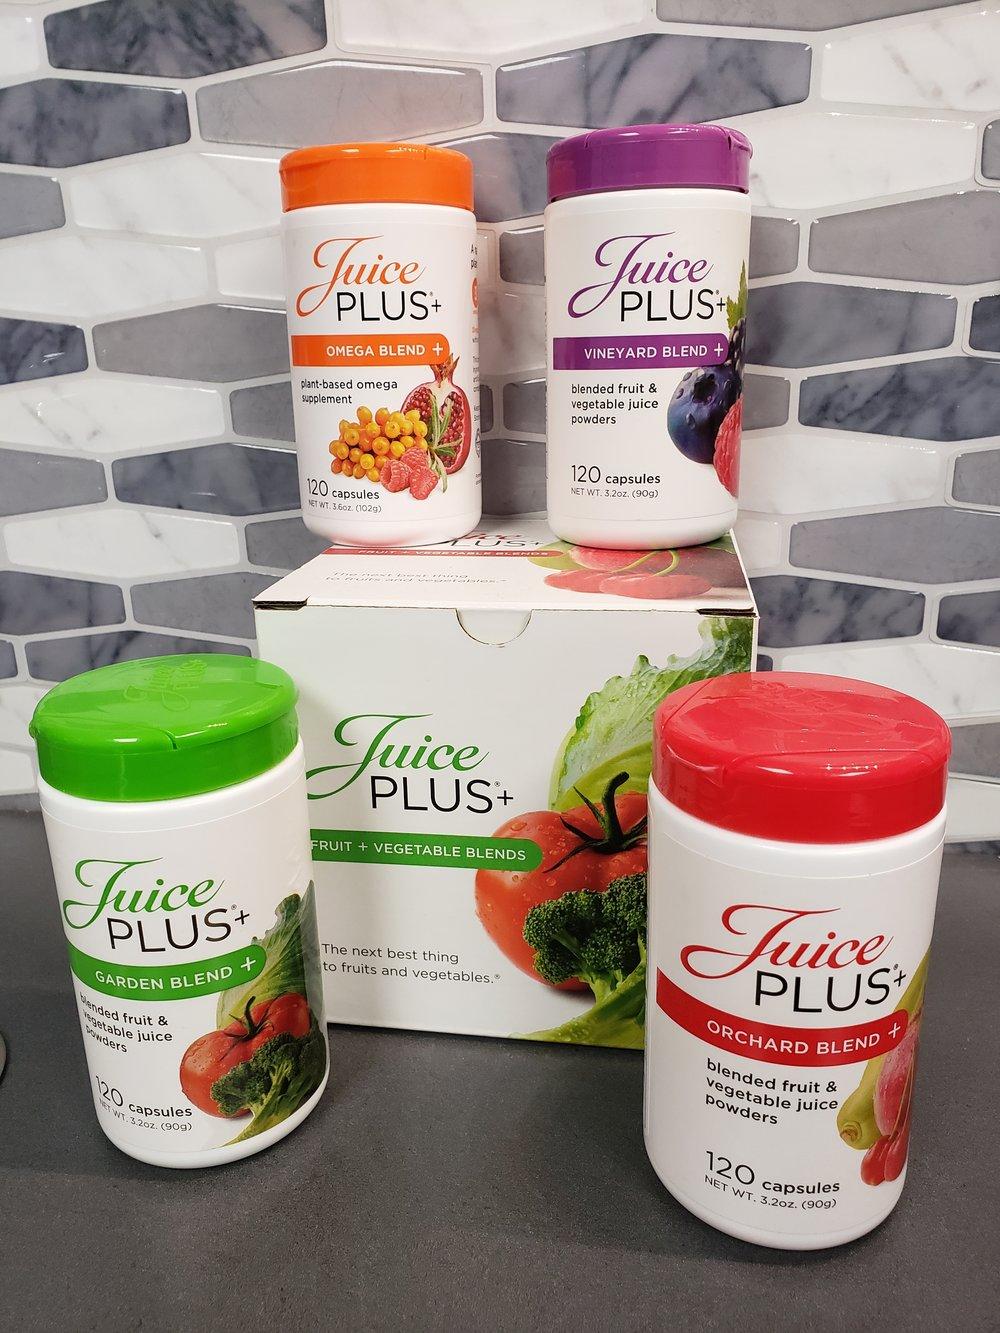 Juice Plus Pic.jpg